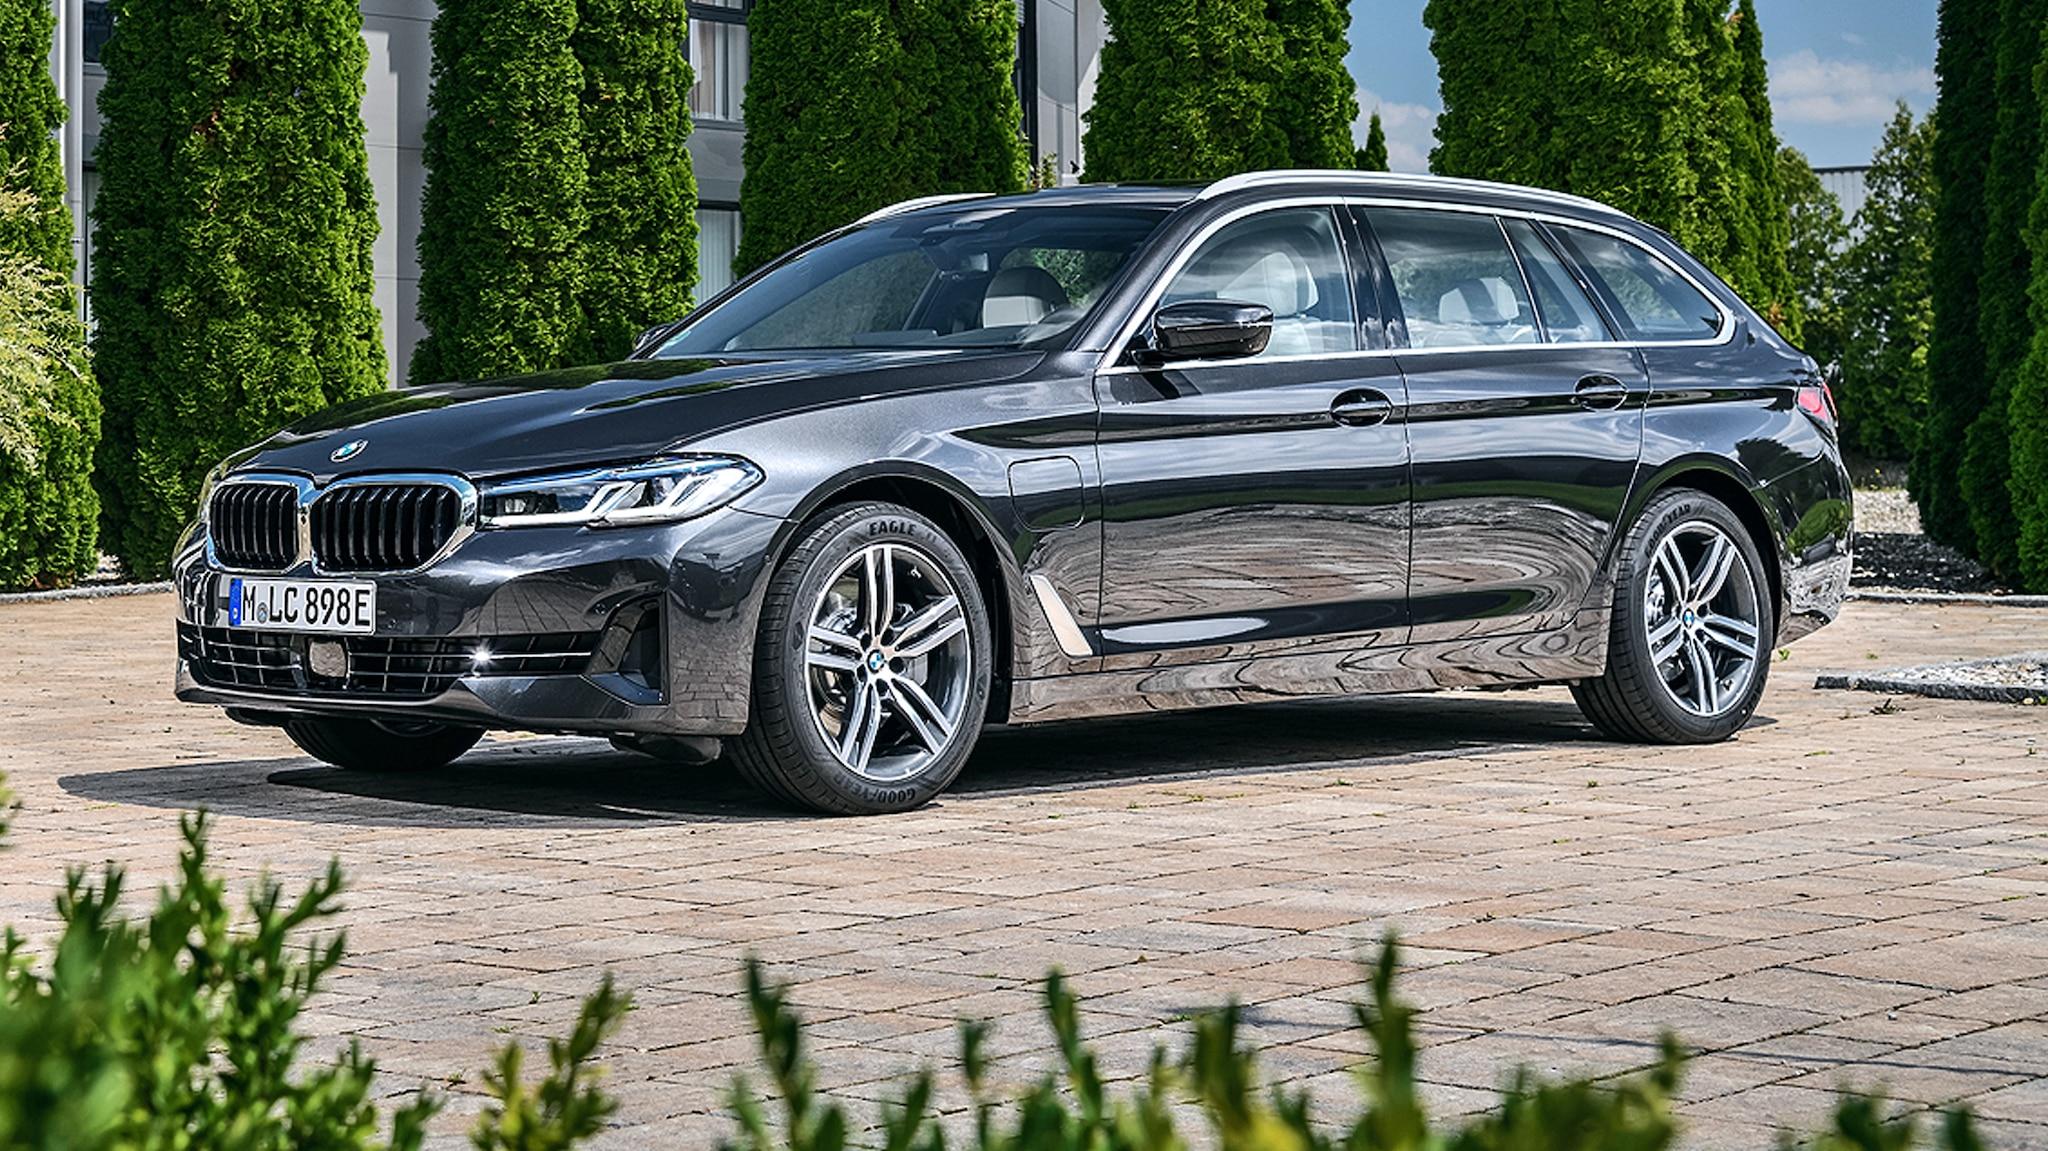 BMW 530e Touring: So viel kostet der Kombi im Leasing